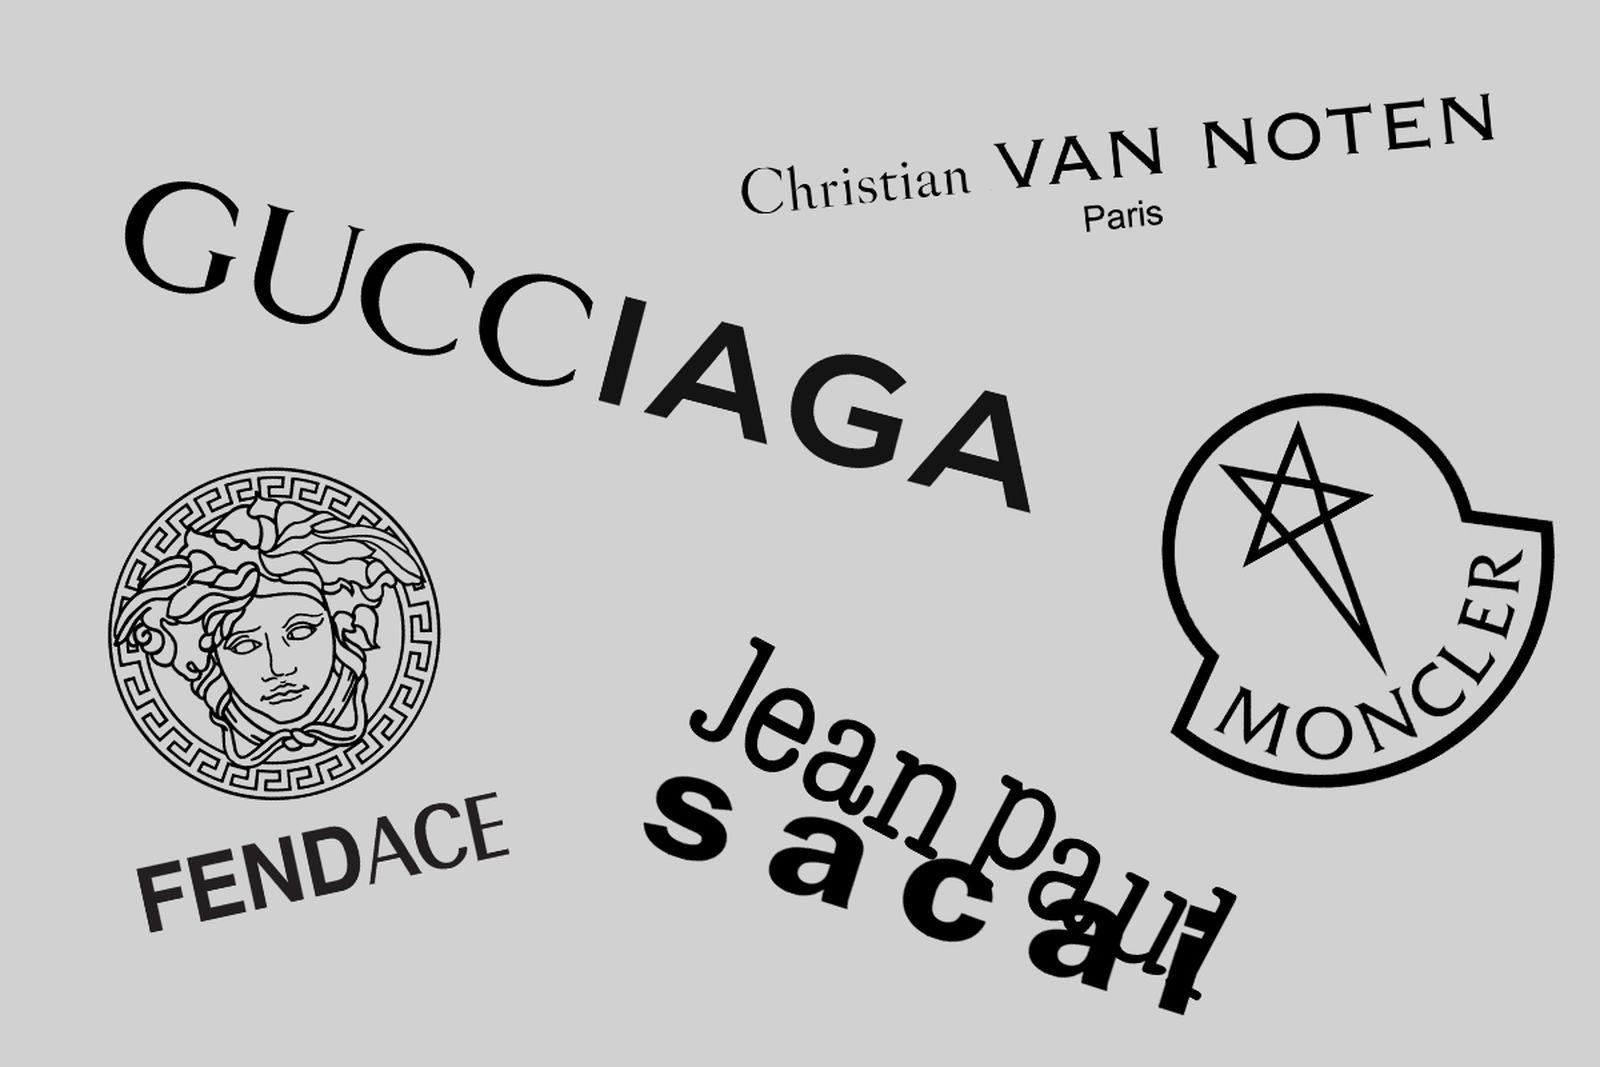 fendace-fendi-versace-cheap-trick-luxury-collaborations-02